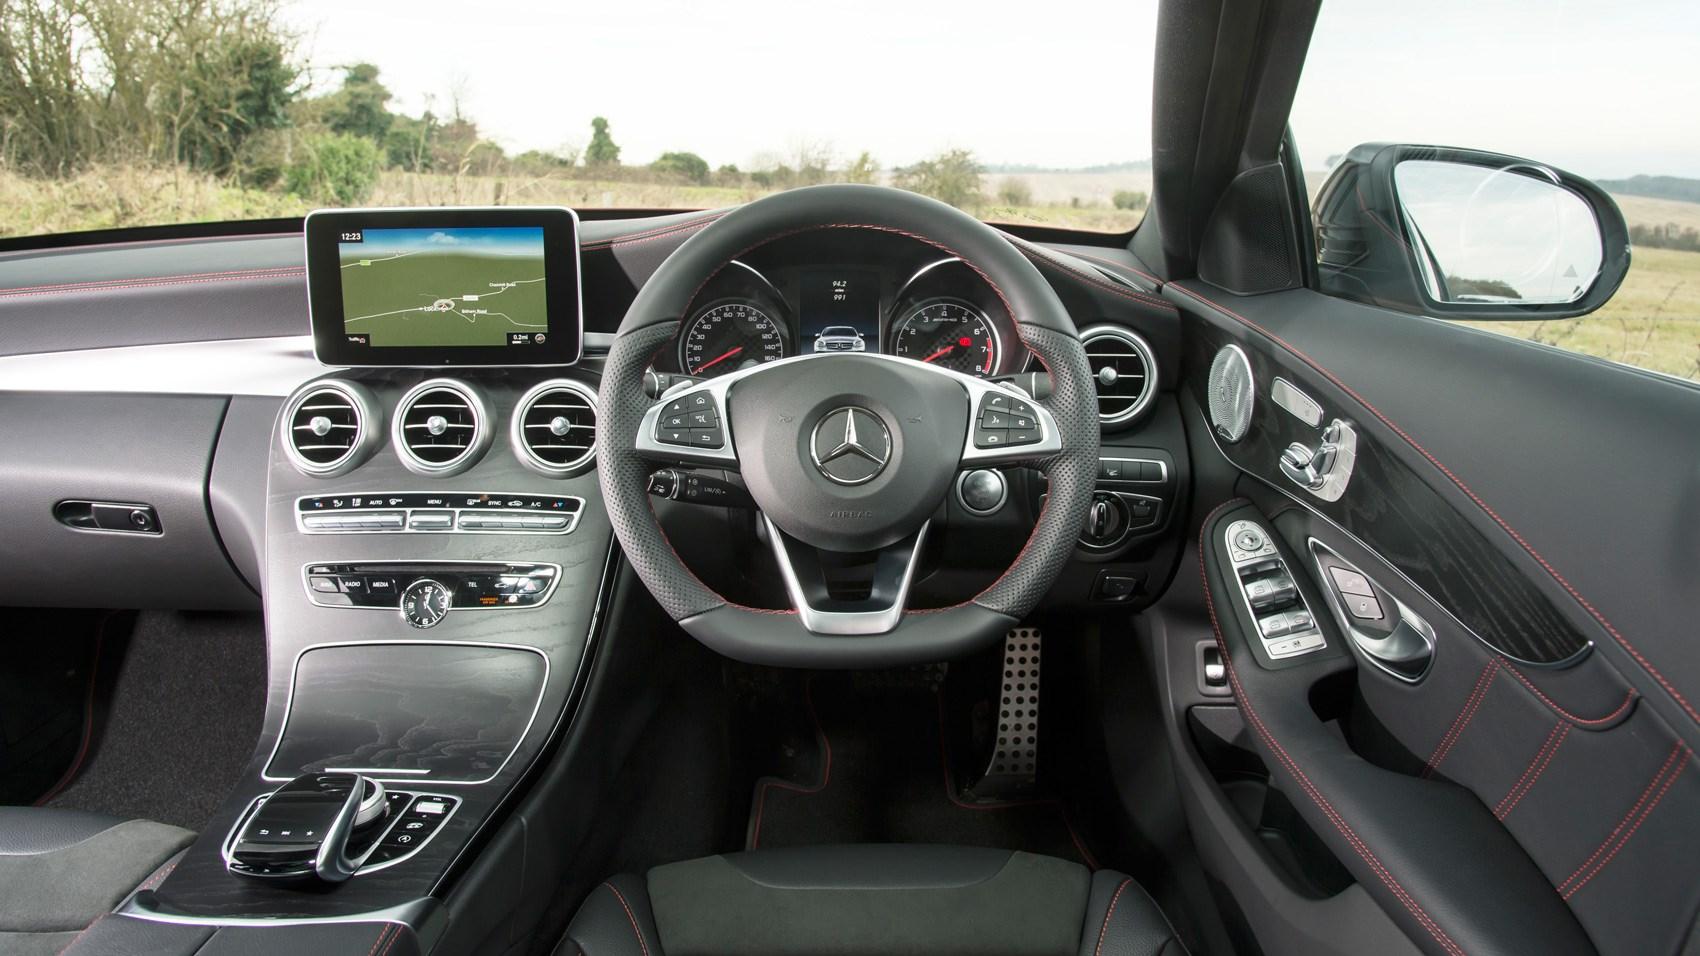 Mercedes-AMG C43 saloon (2017) review | CAR Magazine